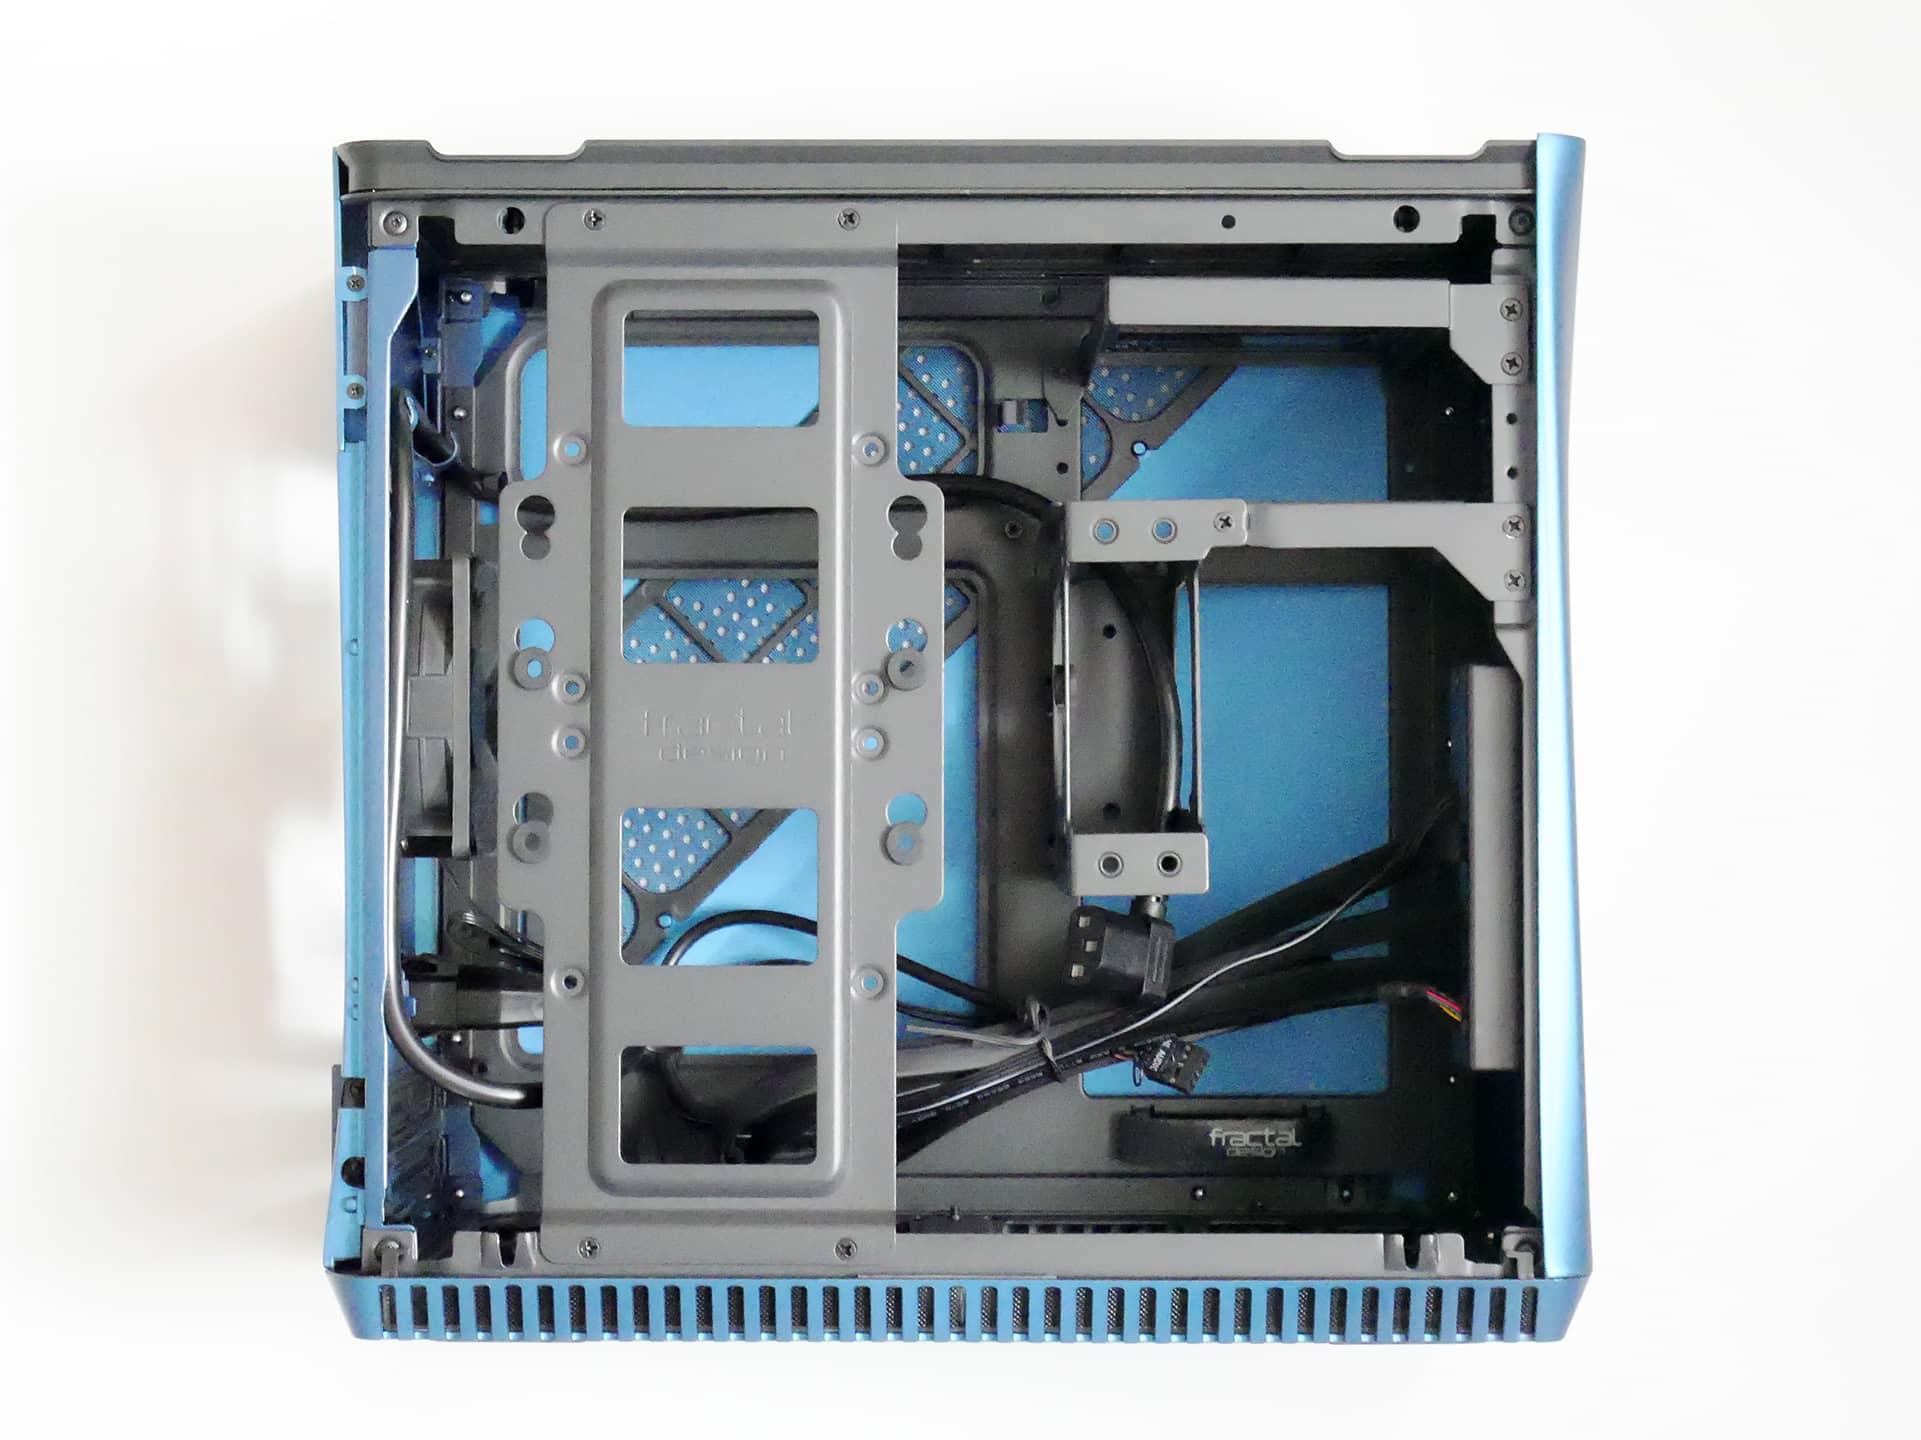 Fractal Design Era ITX の内部